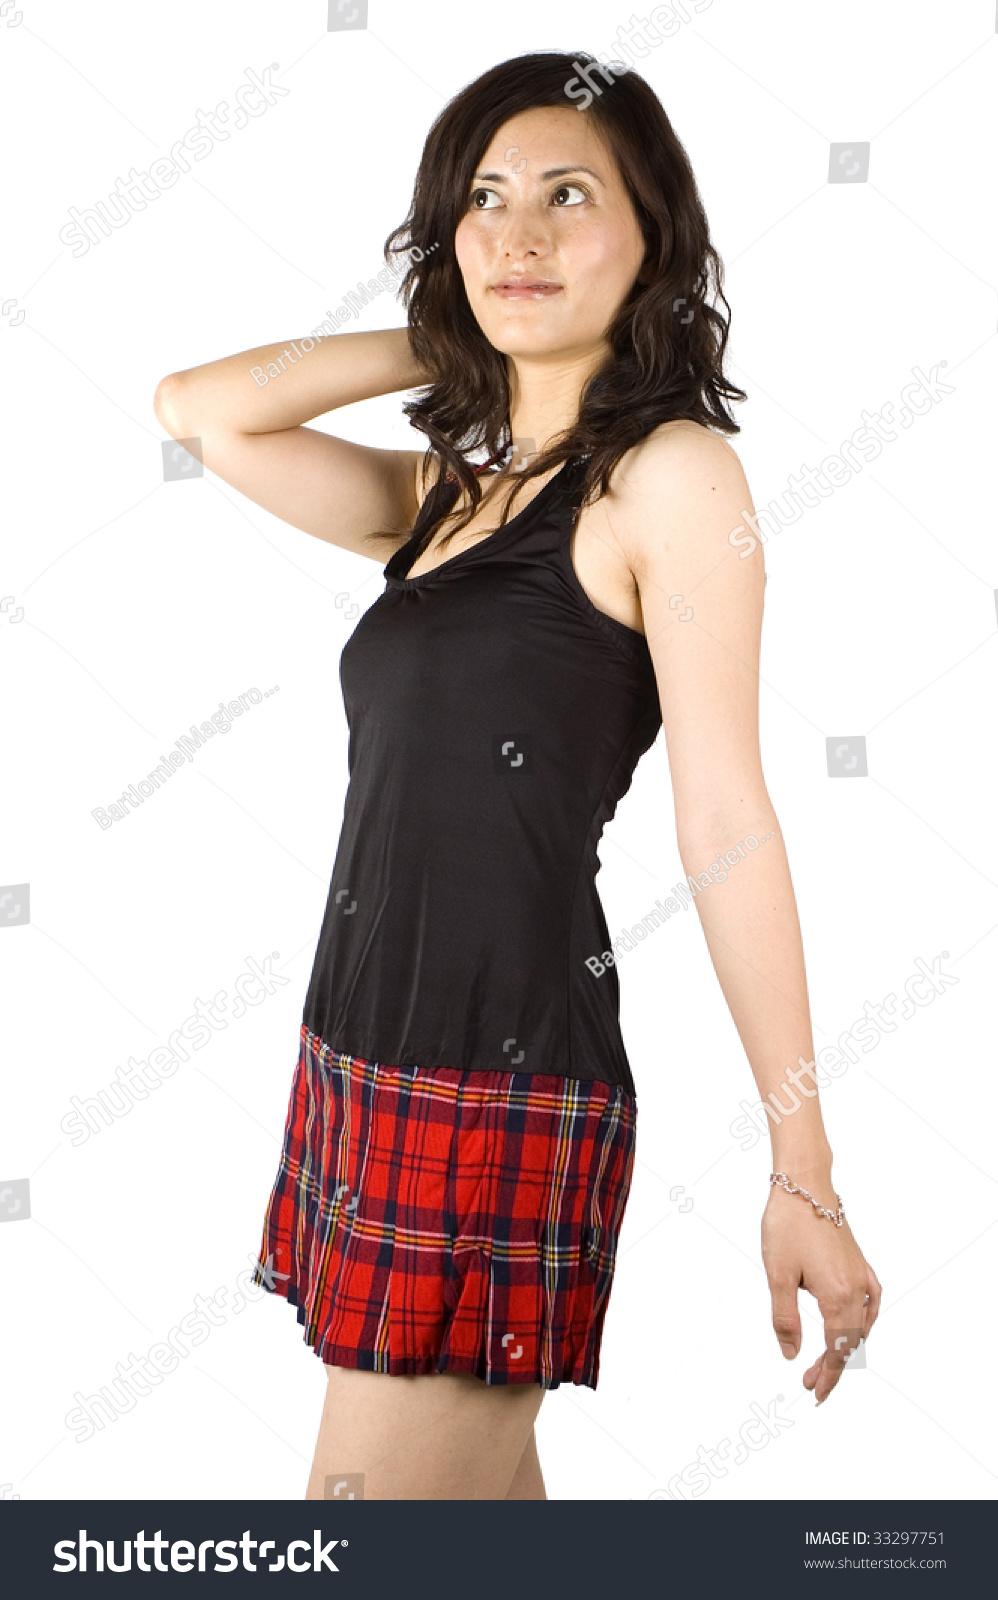 Putting on skirt